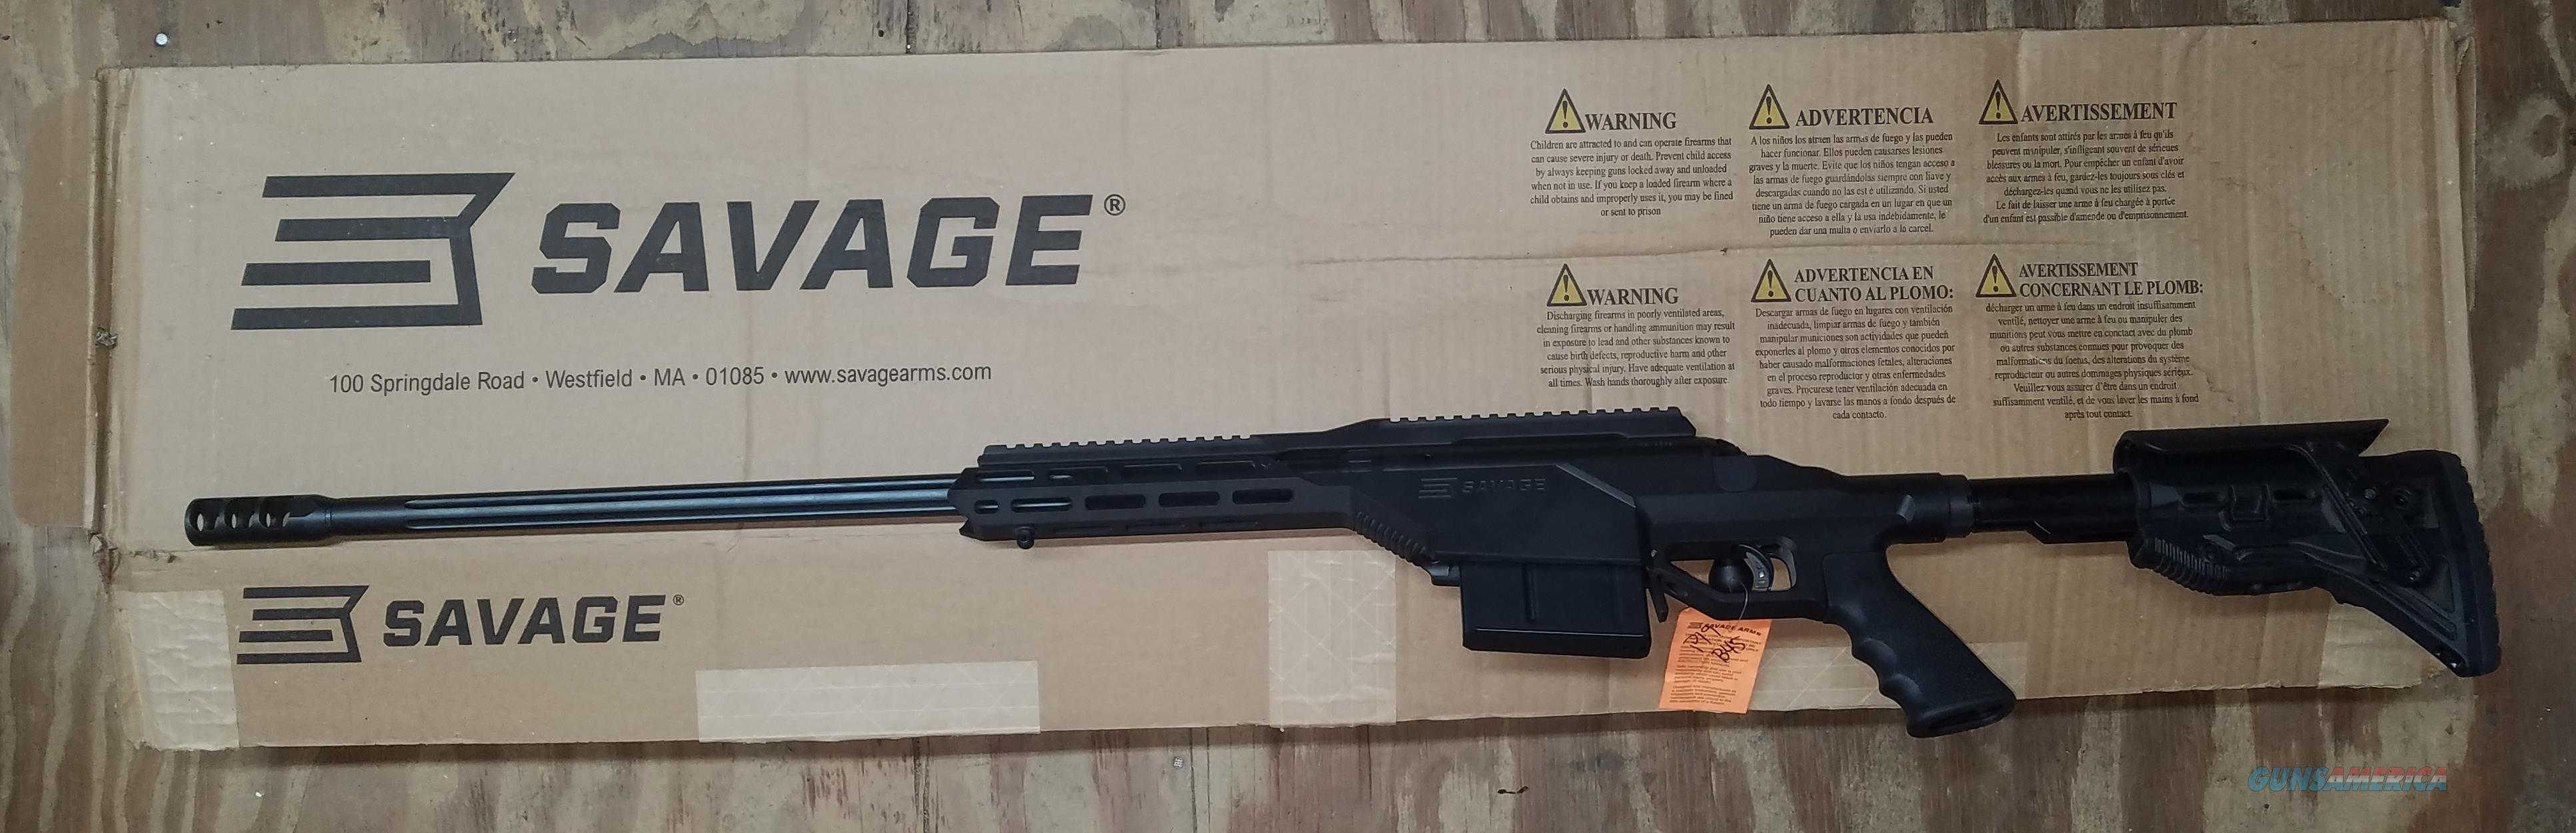 Savage 10/110 BA Stealth .338 Lapua Mag Bolt-Action Rifle 22640  Guns > Rifles > Savage Rifles > Standard Bolt Action > Tactical